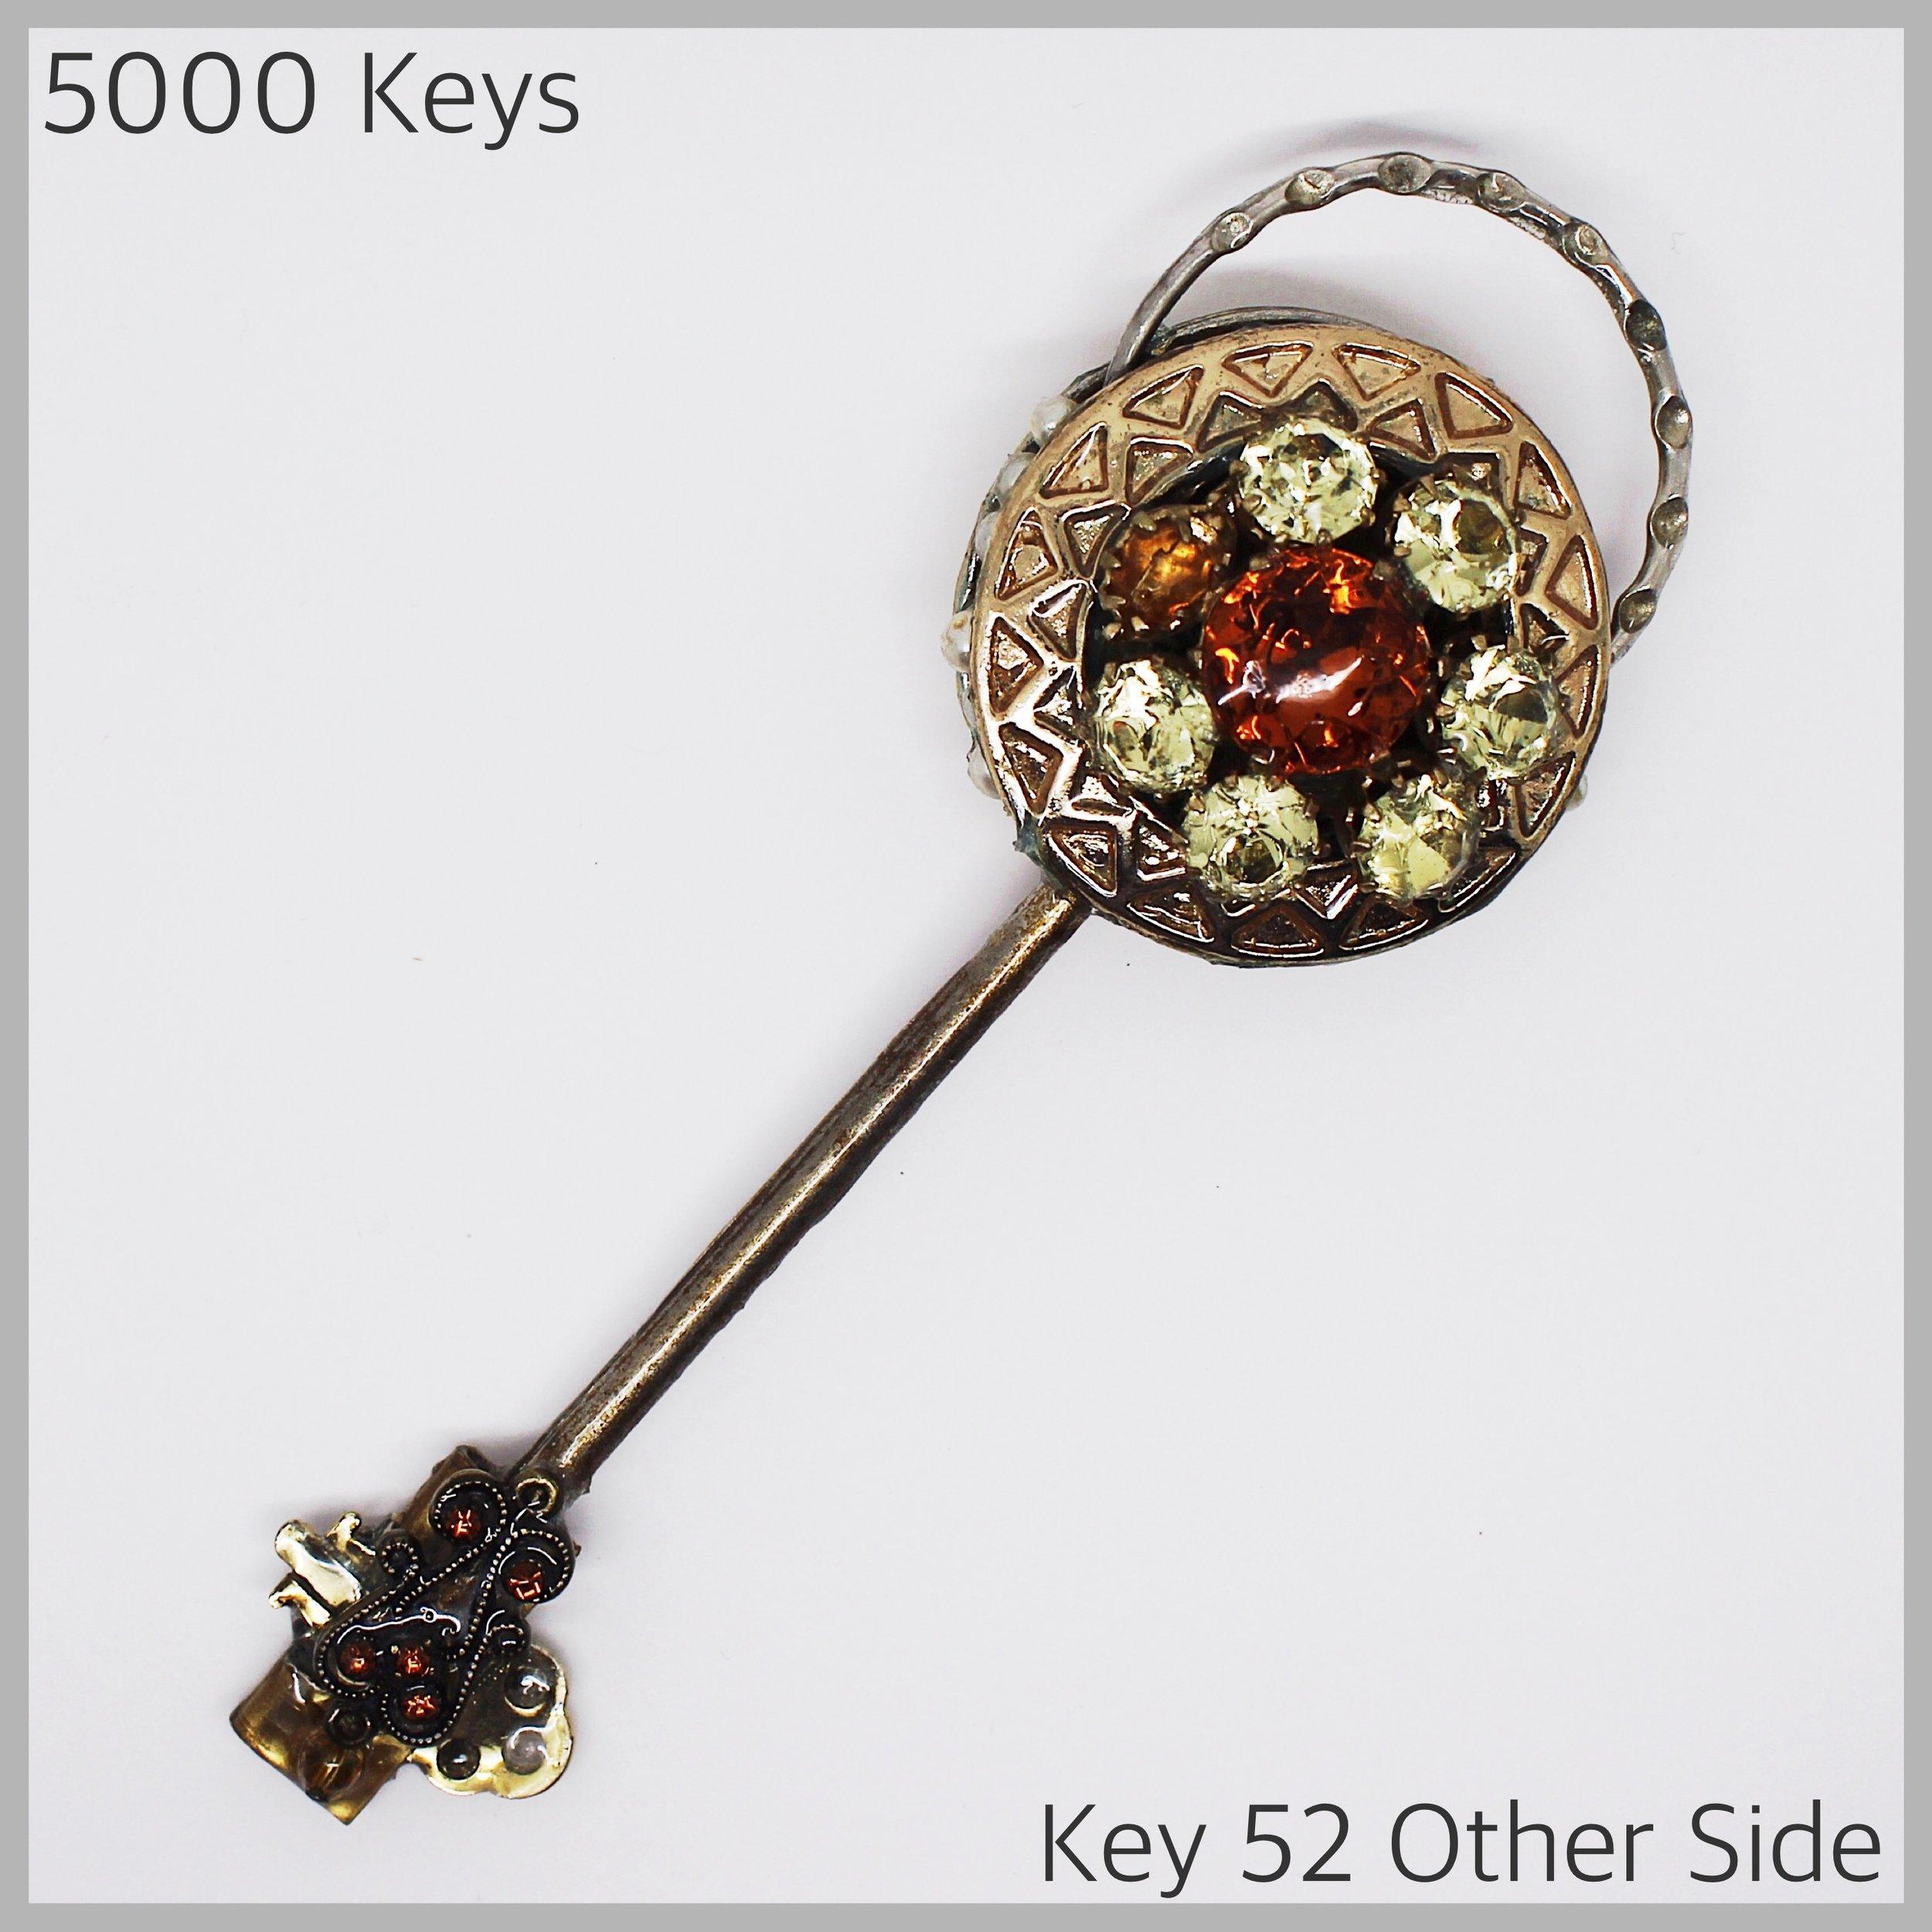 Key 52 other side - 1.JPG